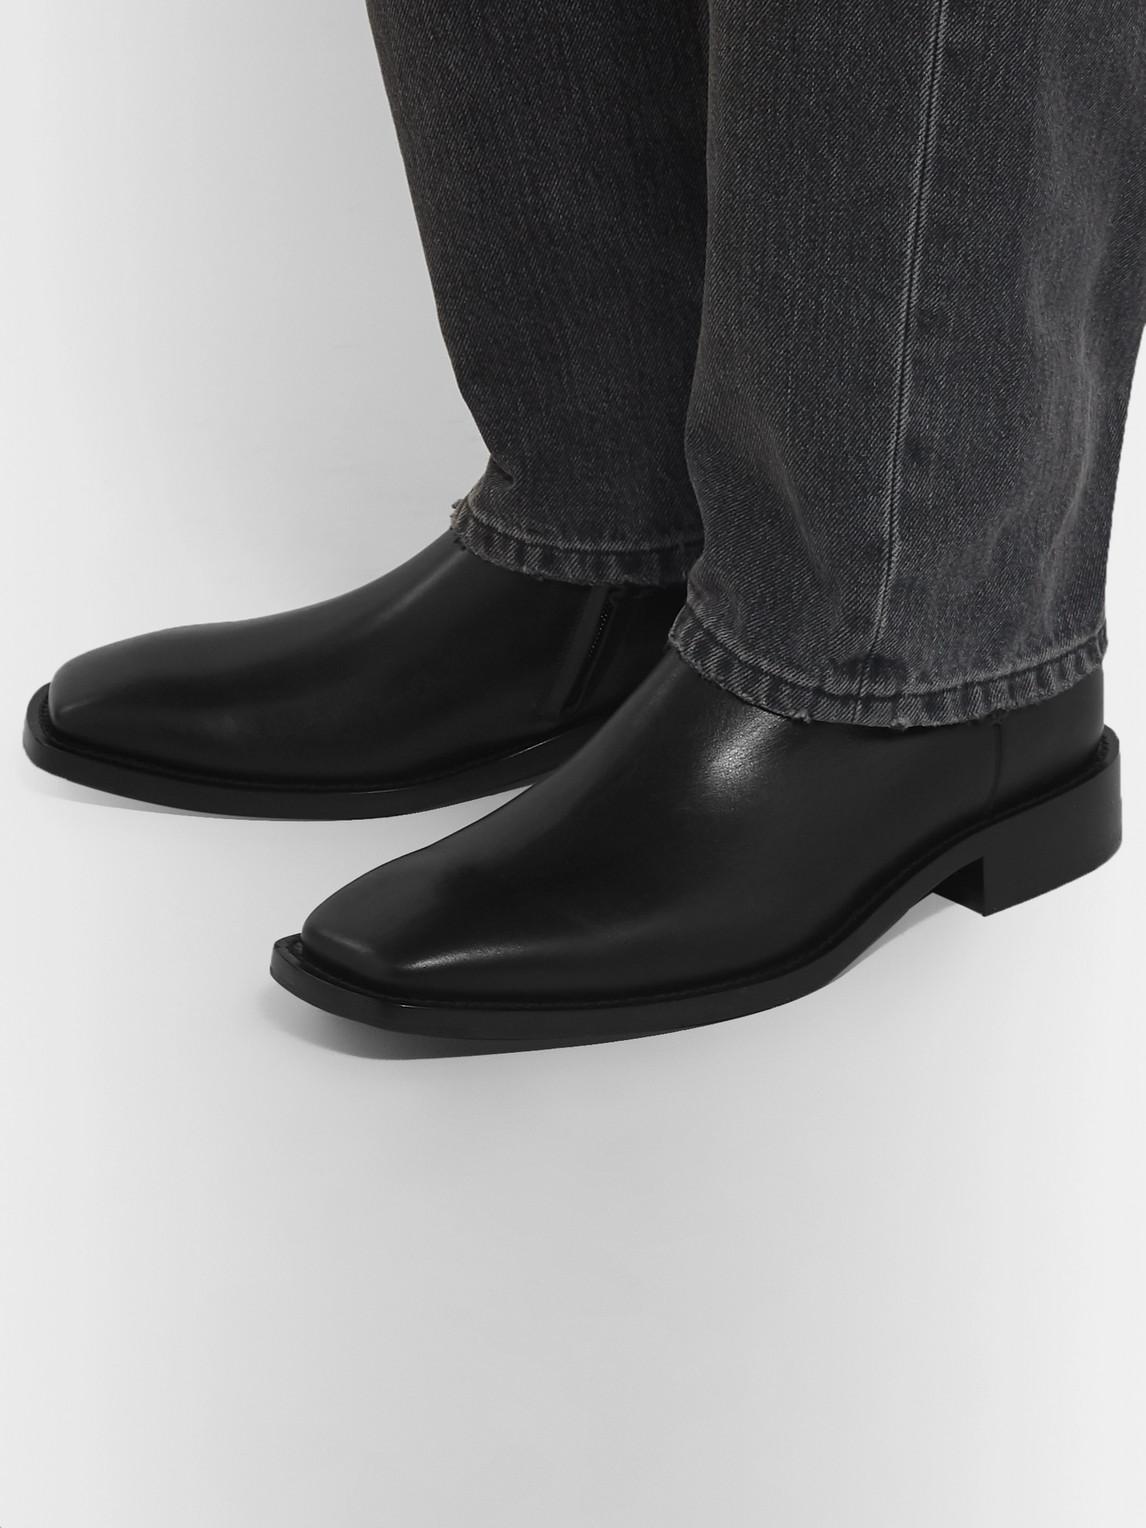 Balenciaga Boots POLISHED-LEATHER BOOTS